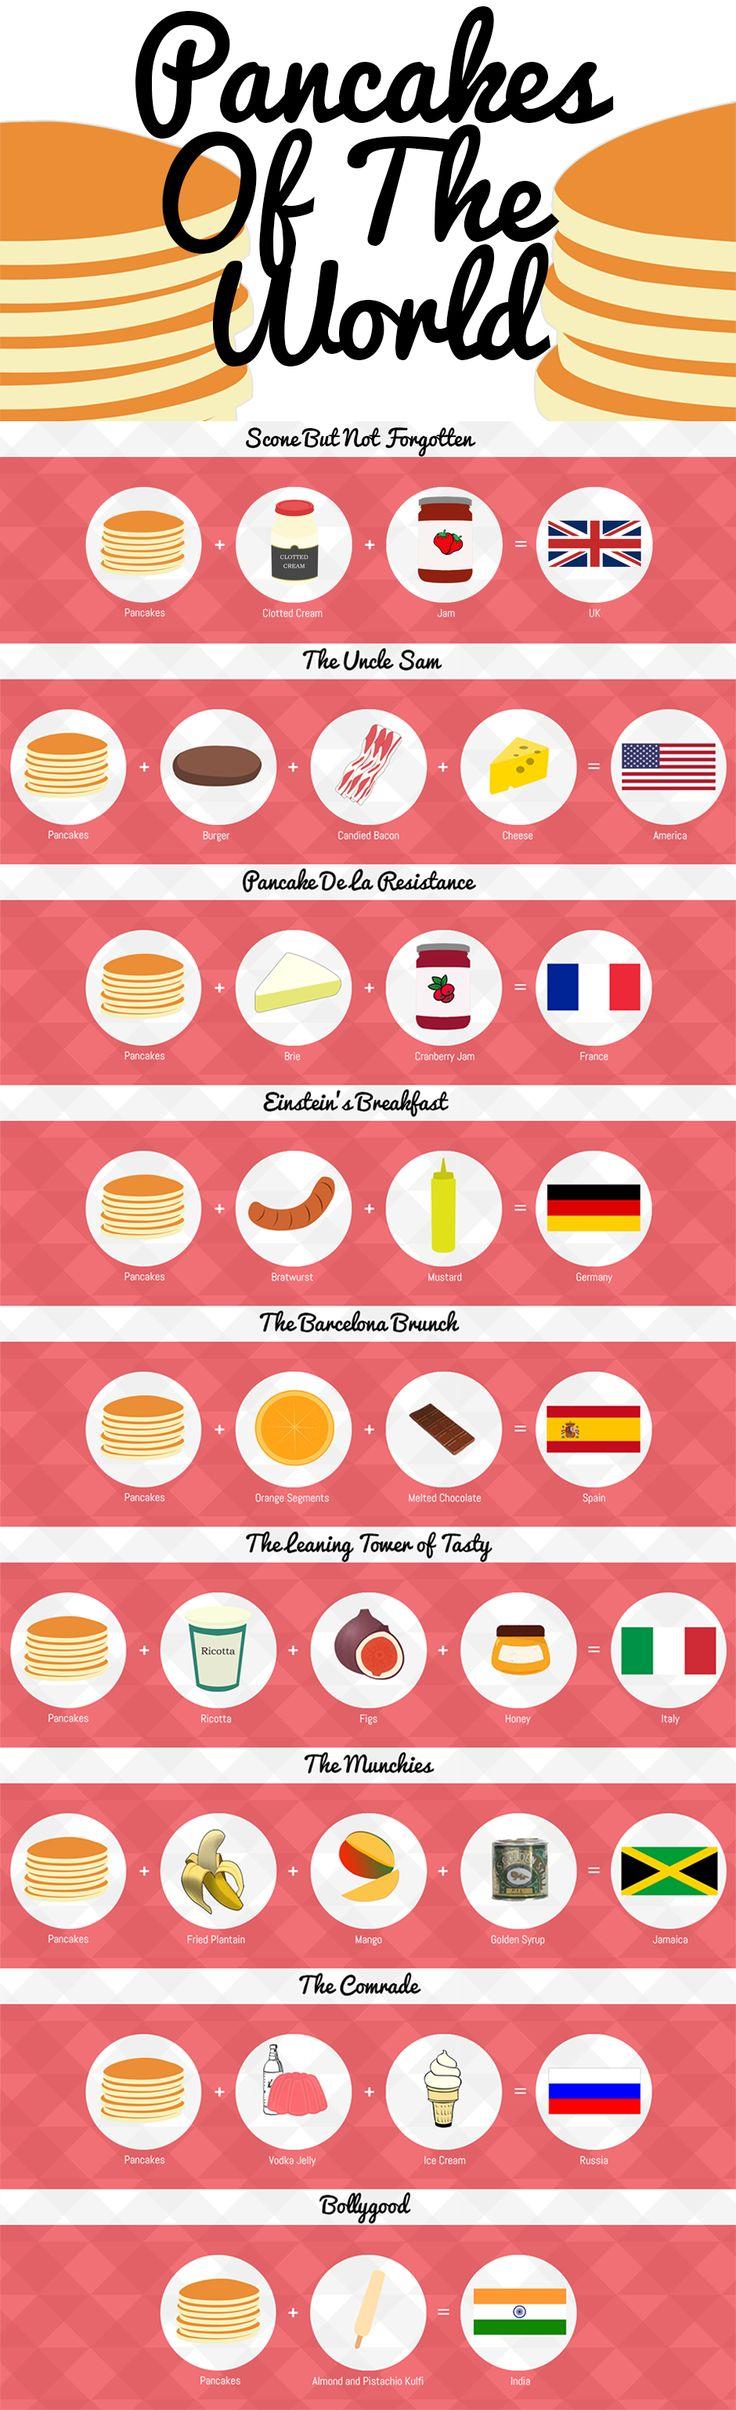 Pancakes of the World | #foodsoftheworld #eatingpsych #bettycapaldiphillips eatingpsych.com